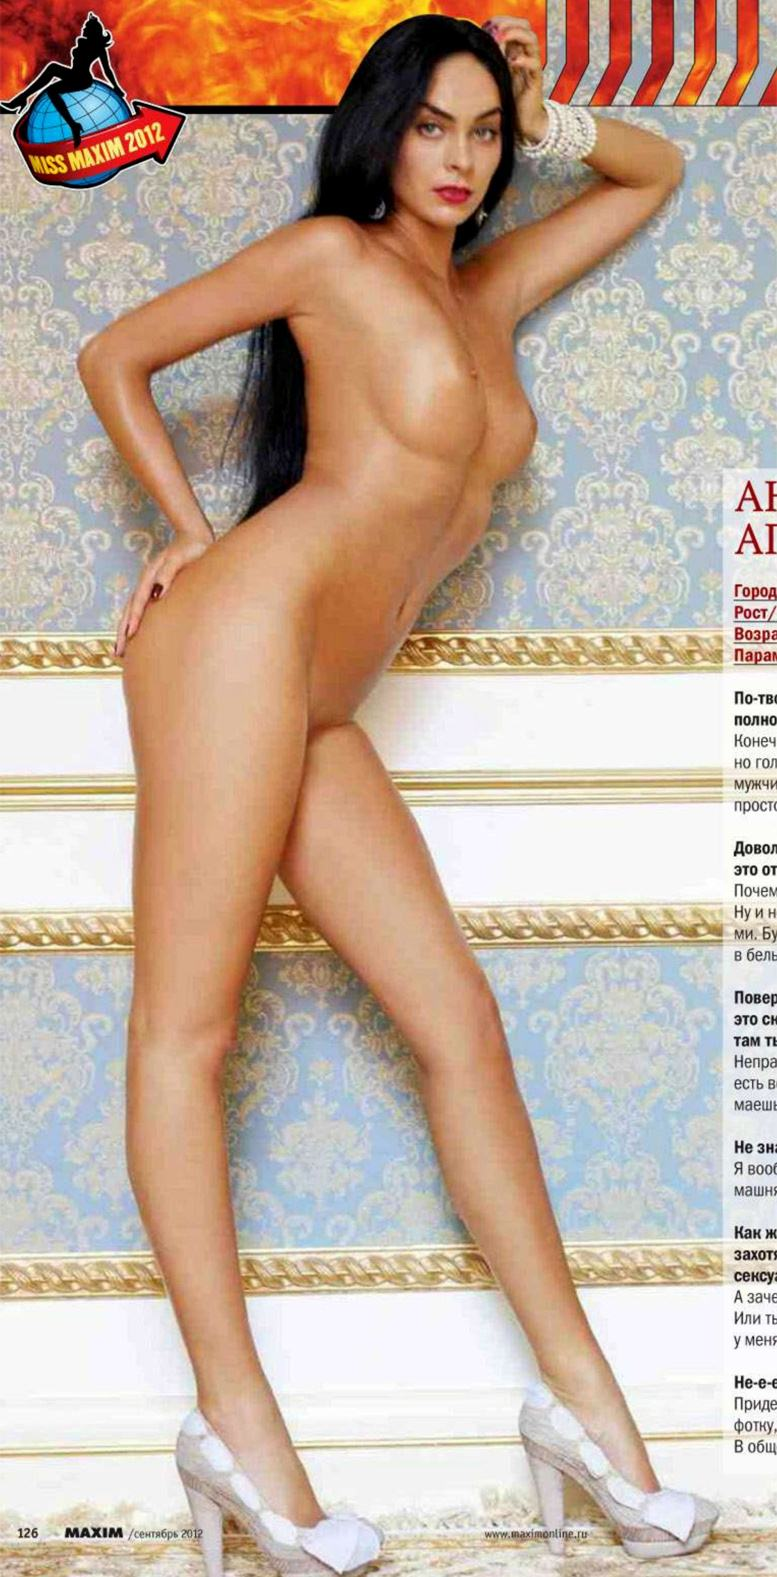 Miss Maxim 2012 в журнале Maxim Россия, сентябрь 2012 - Ангелина Апряткина